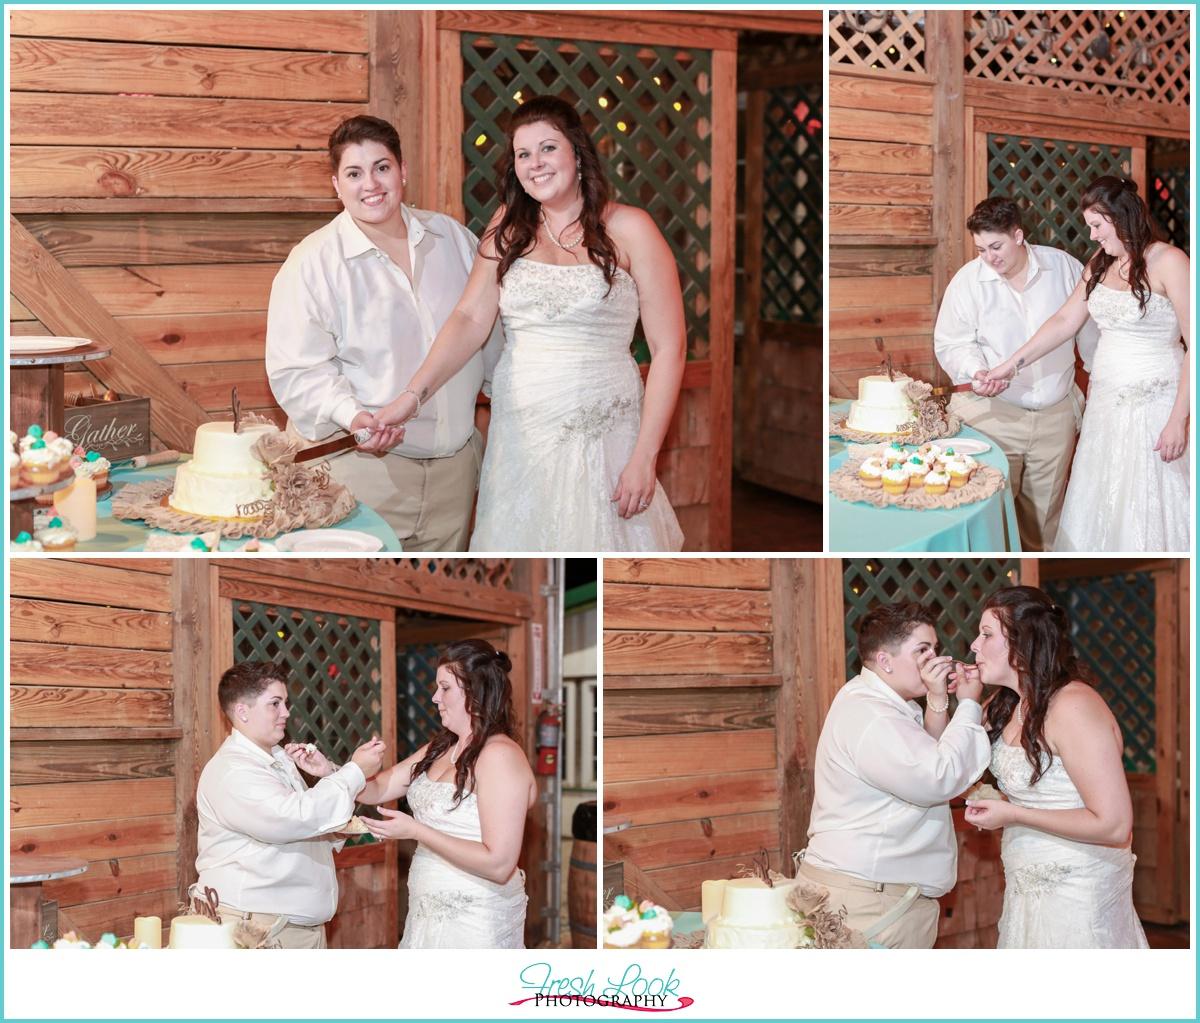 cake cutting at reception